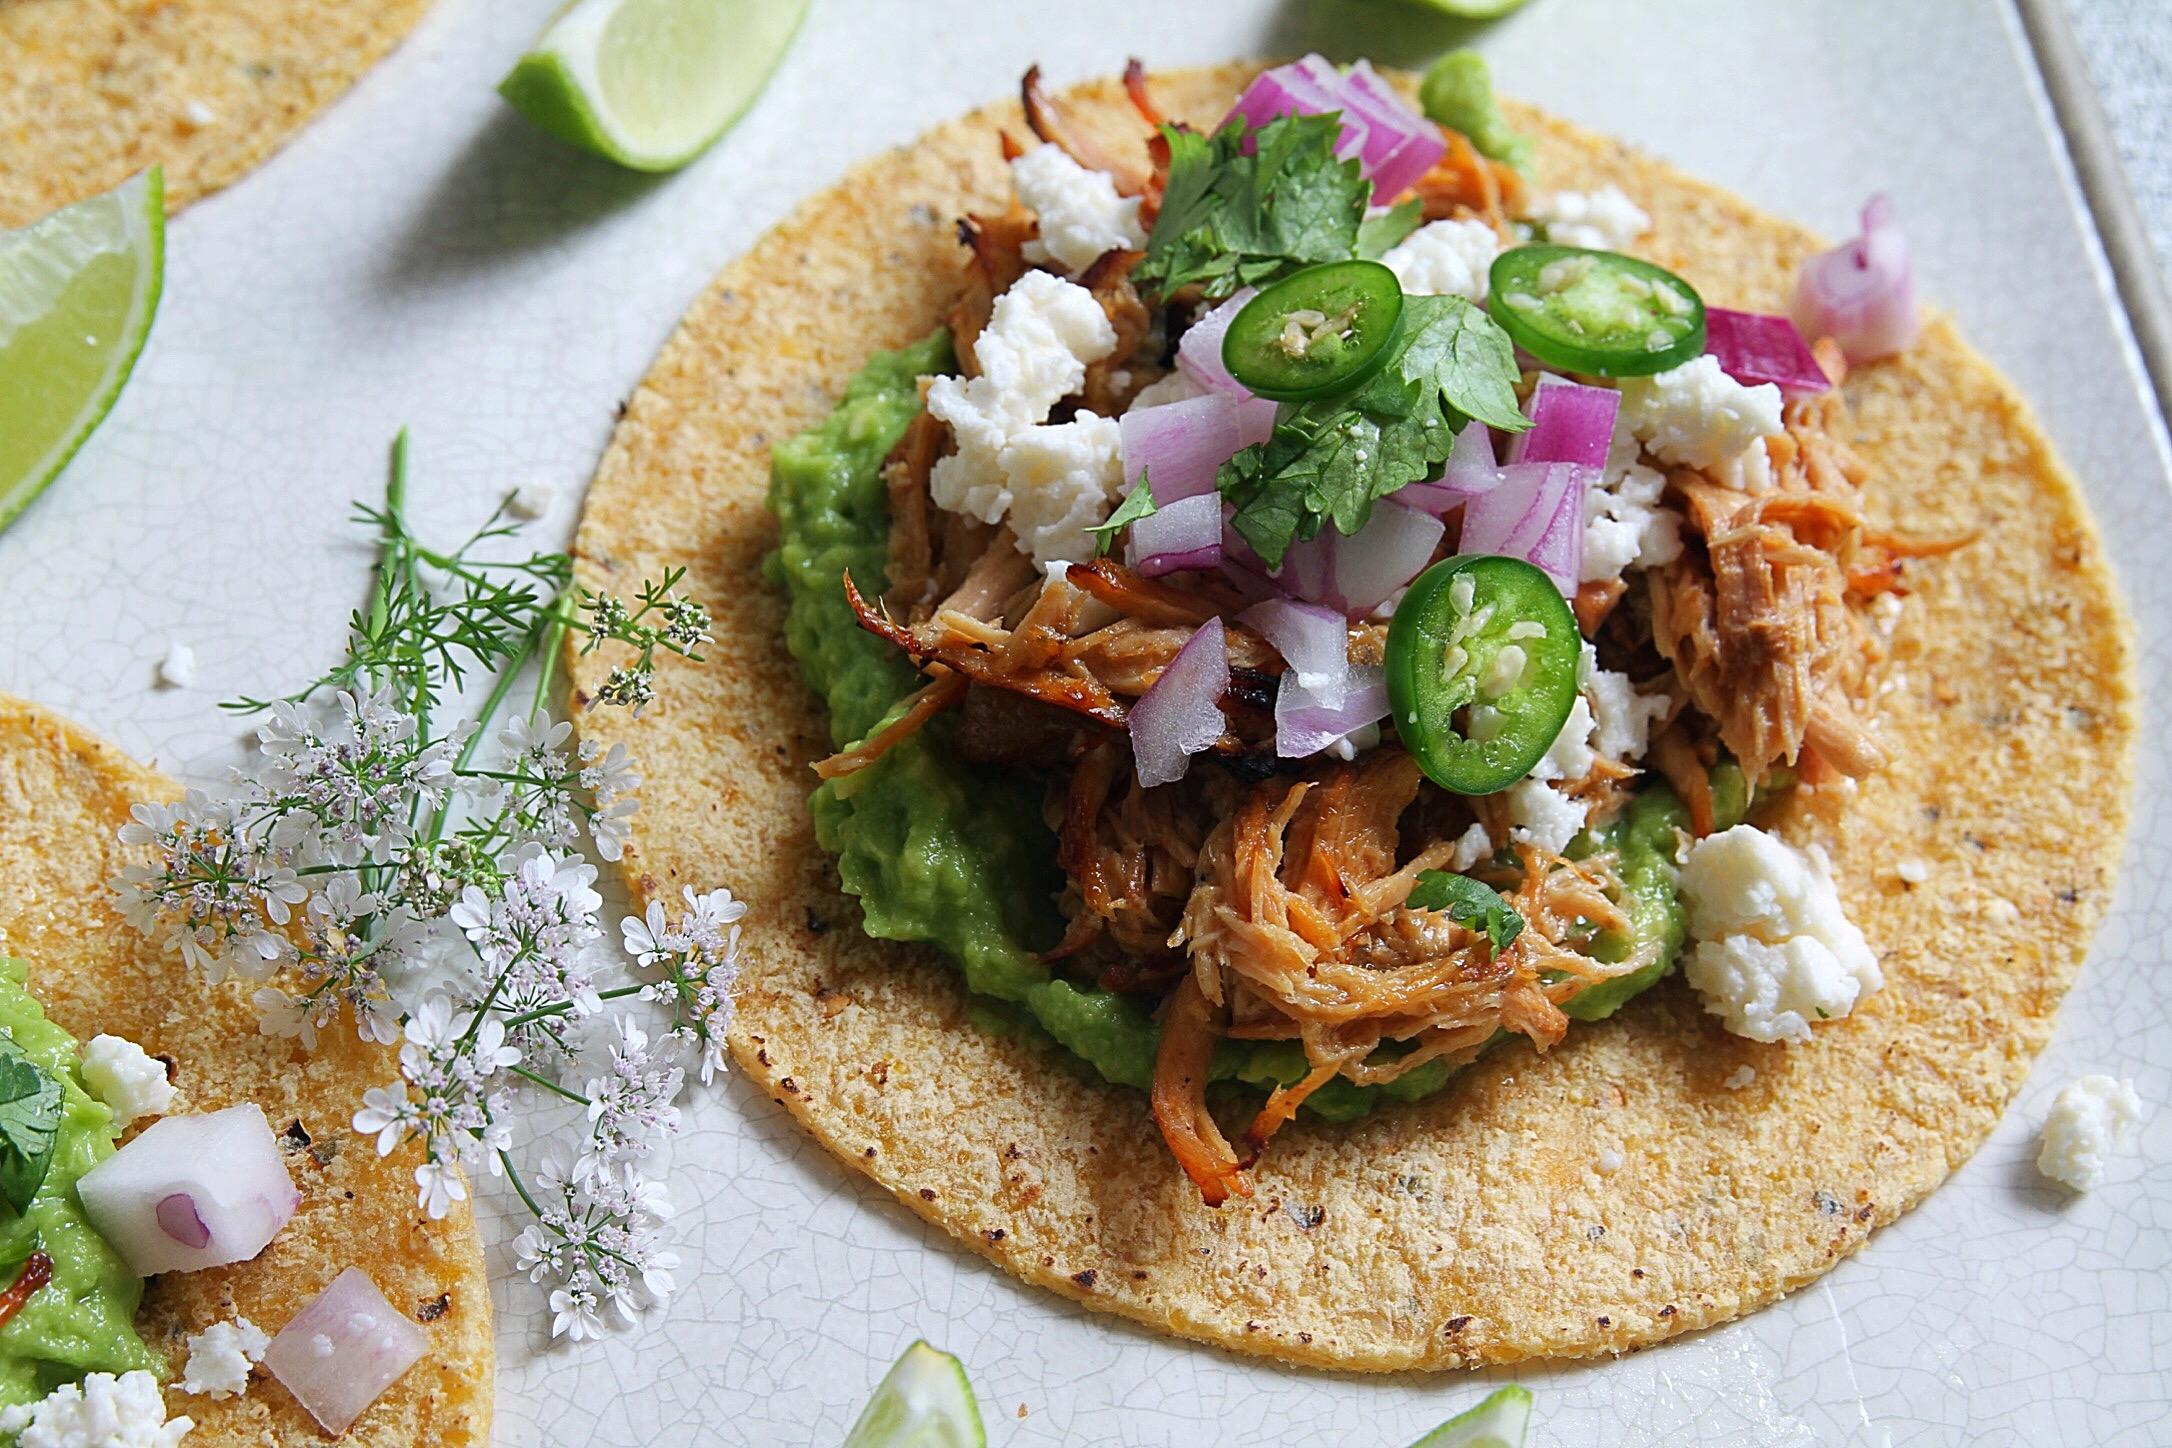 Tacos! Carnitas.